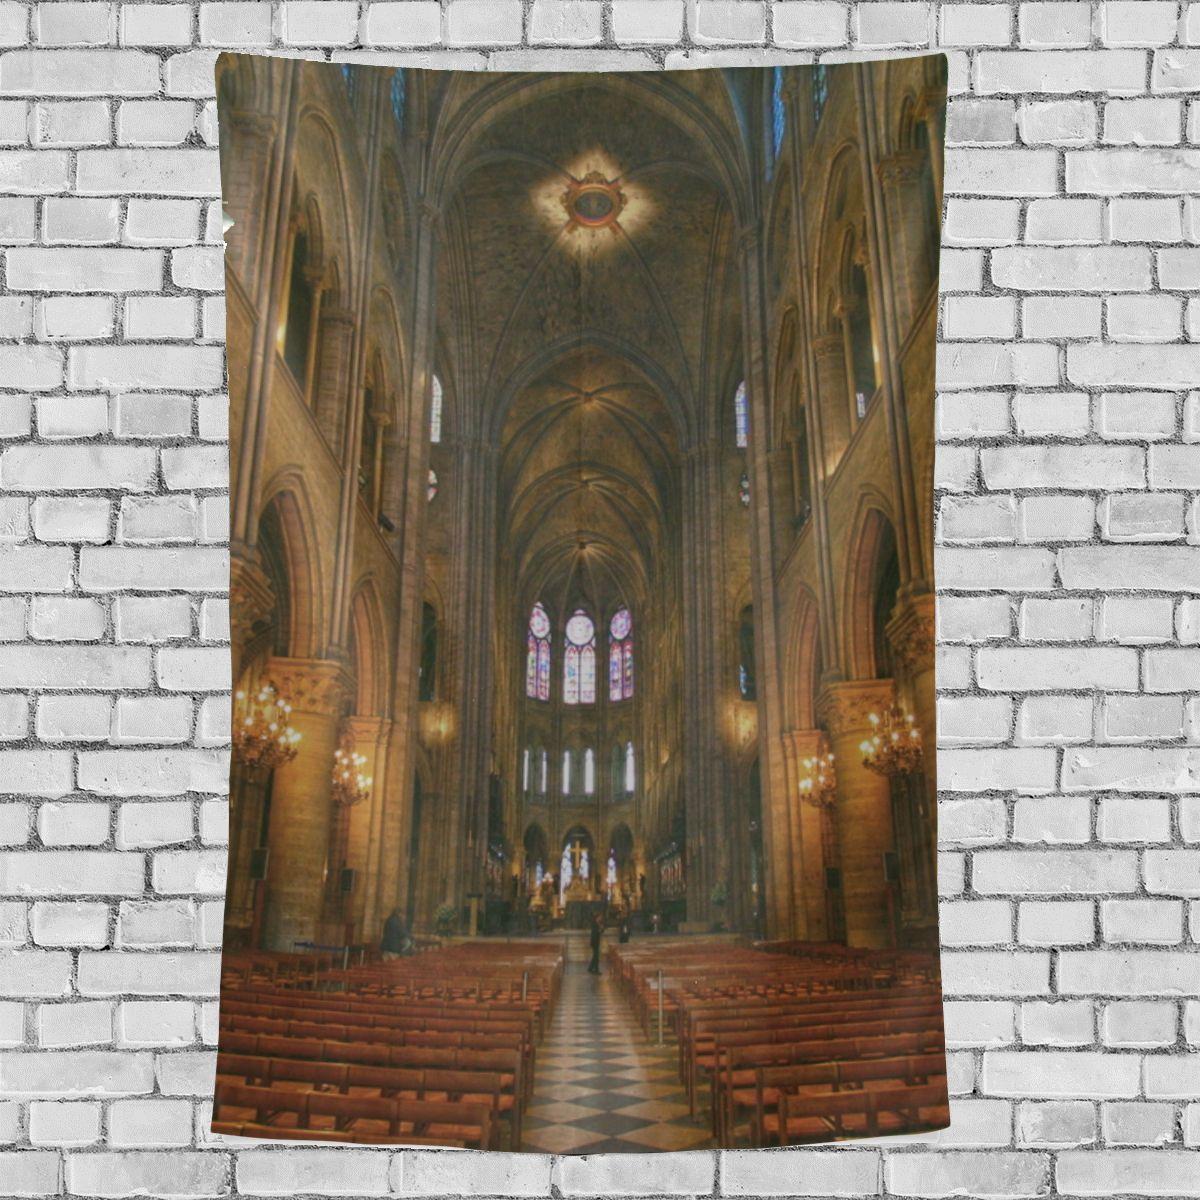 Notre Dame Home Decor: Gallery Wall Decor Notre Dame De Paris Beautiful Light